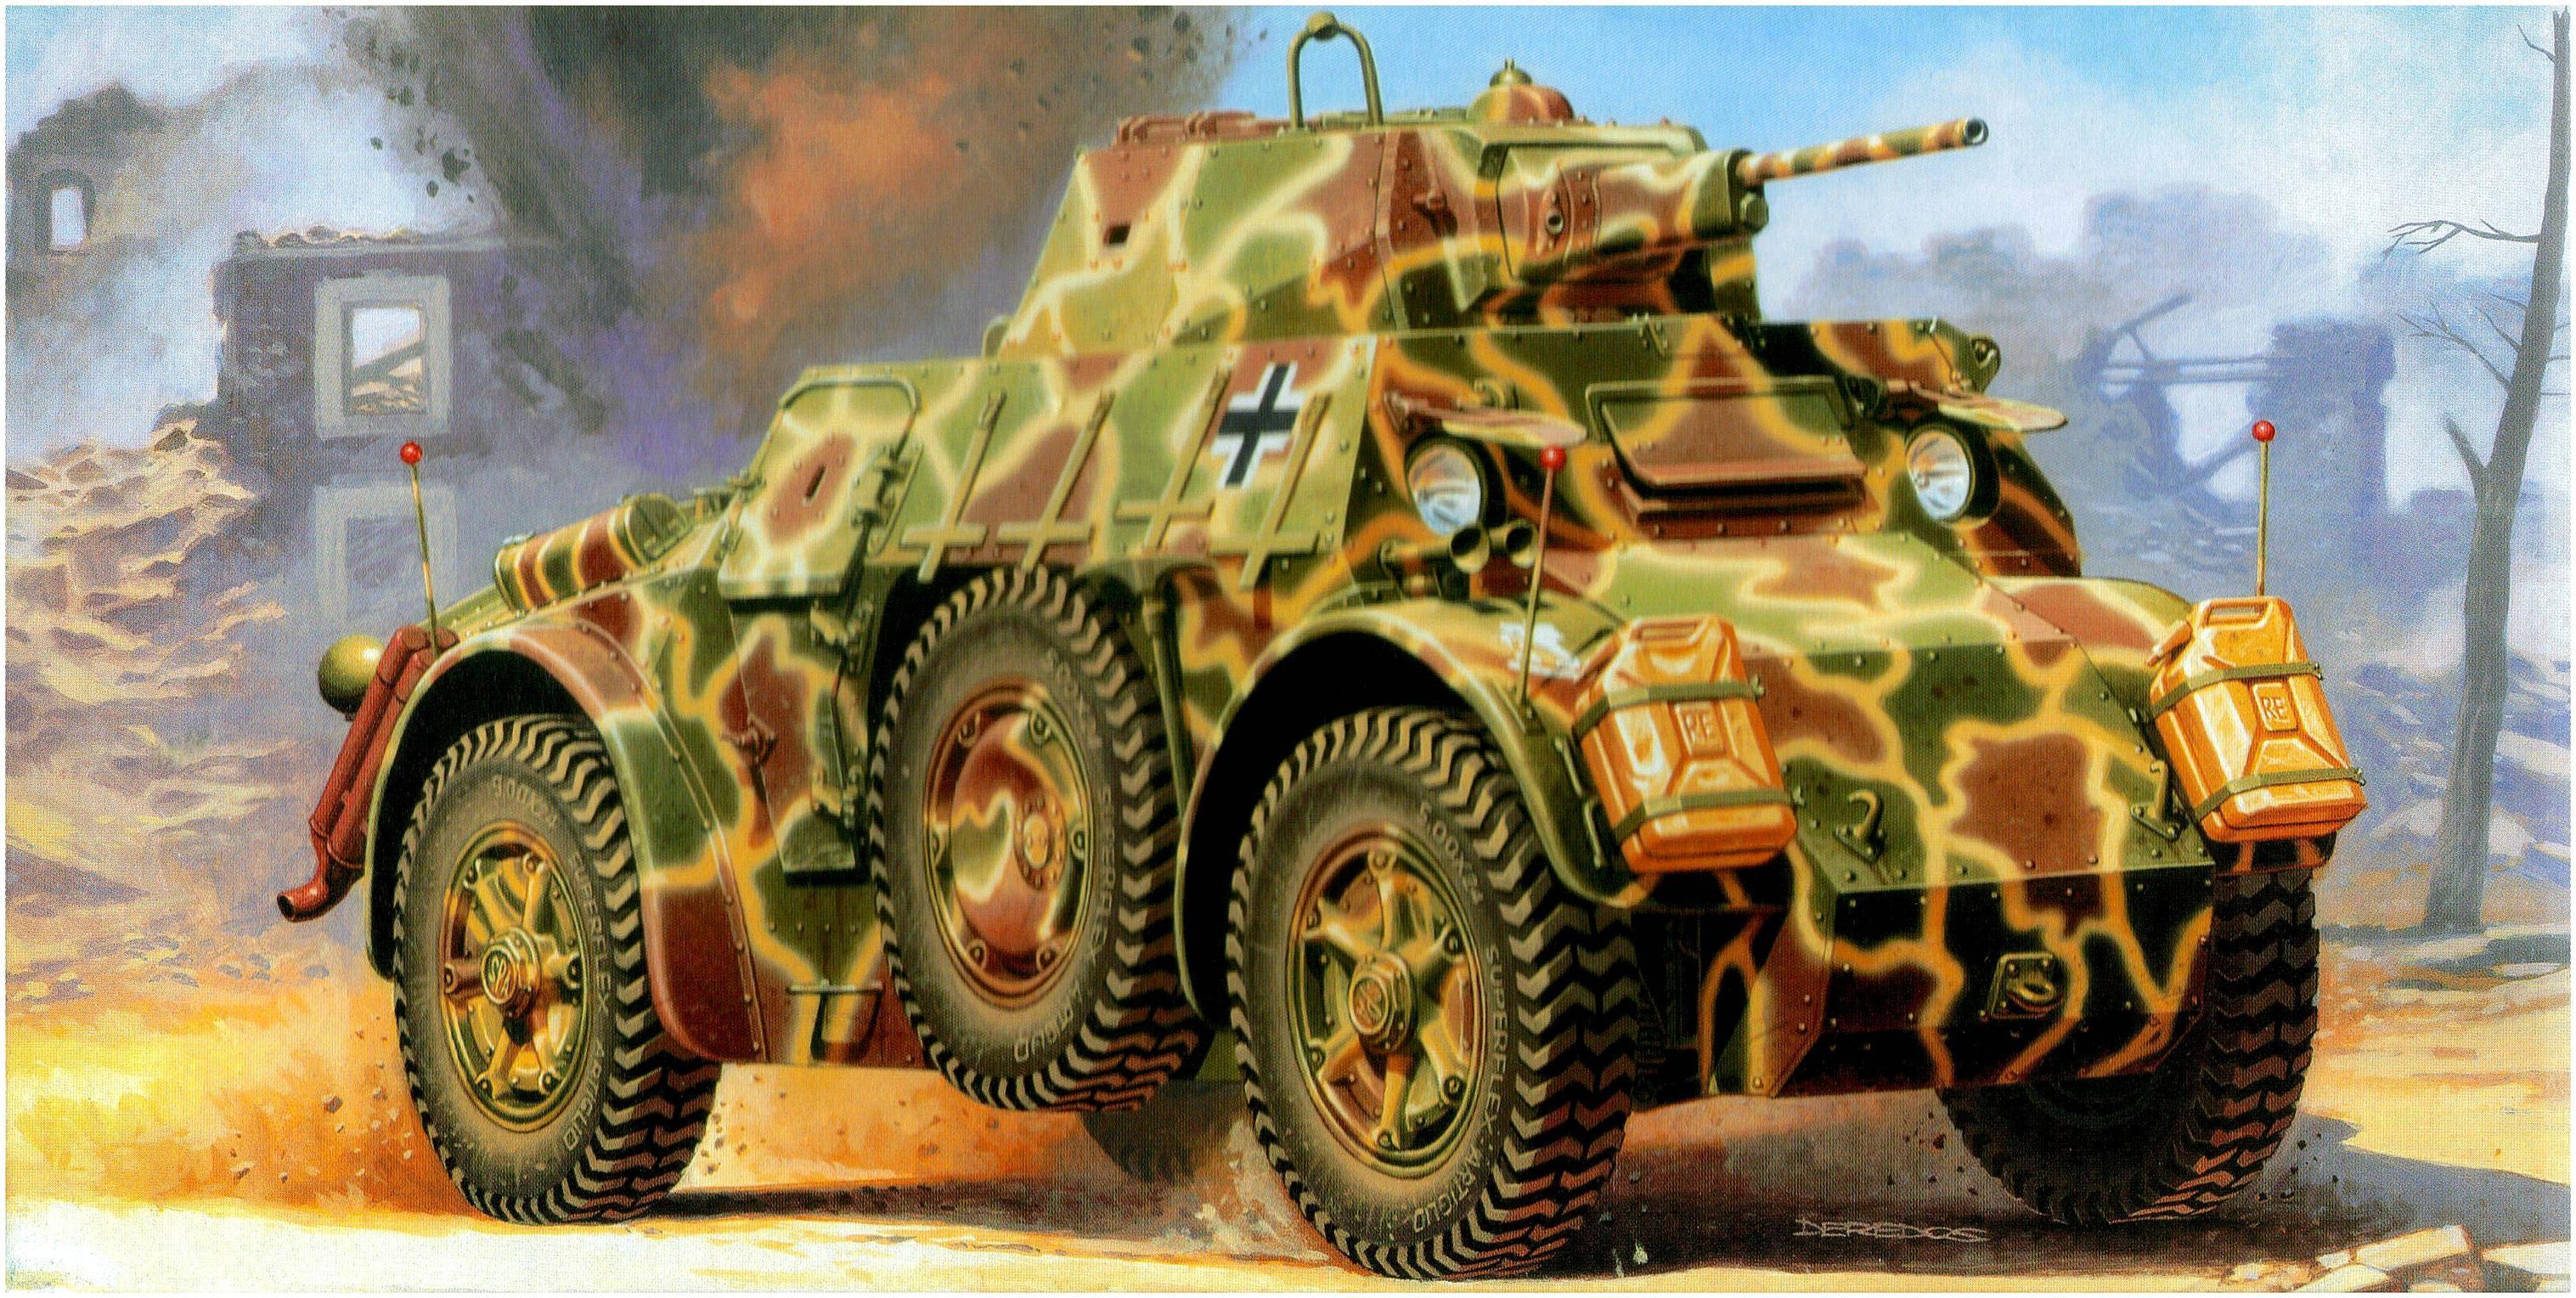 Deredos Andrzej. Бронеавтомобиль Autoblinda AB-43.